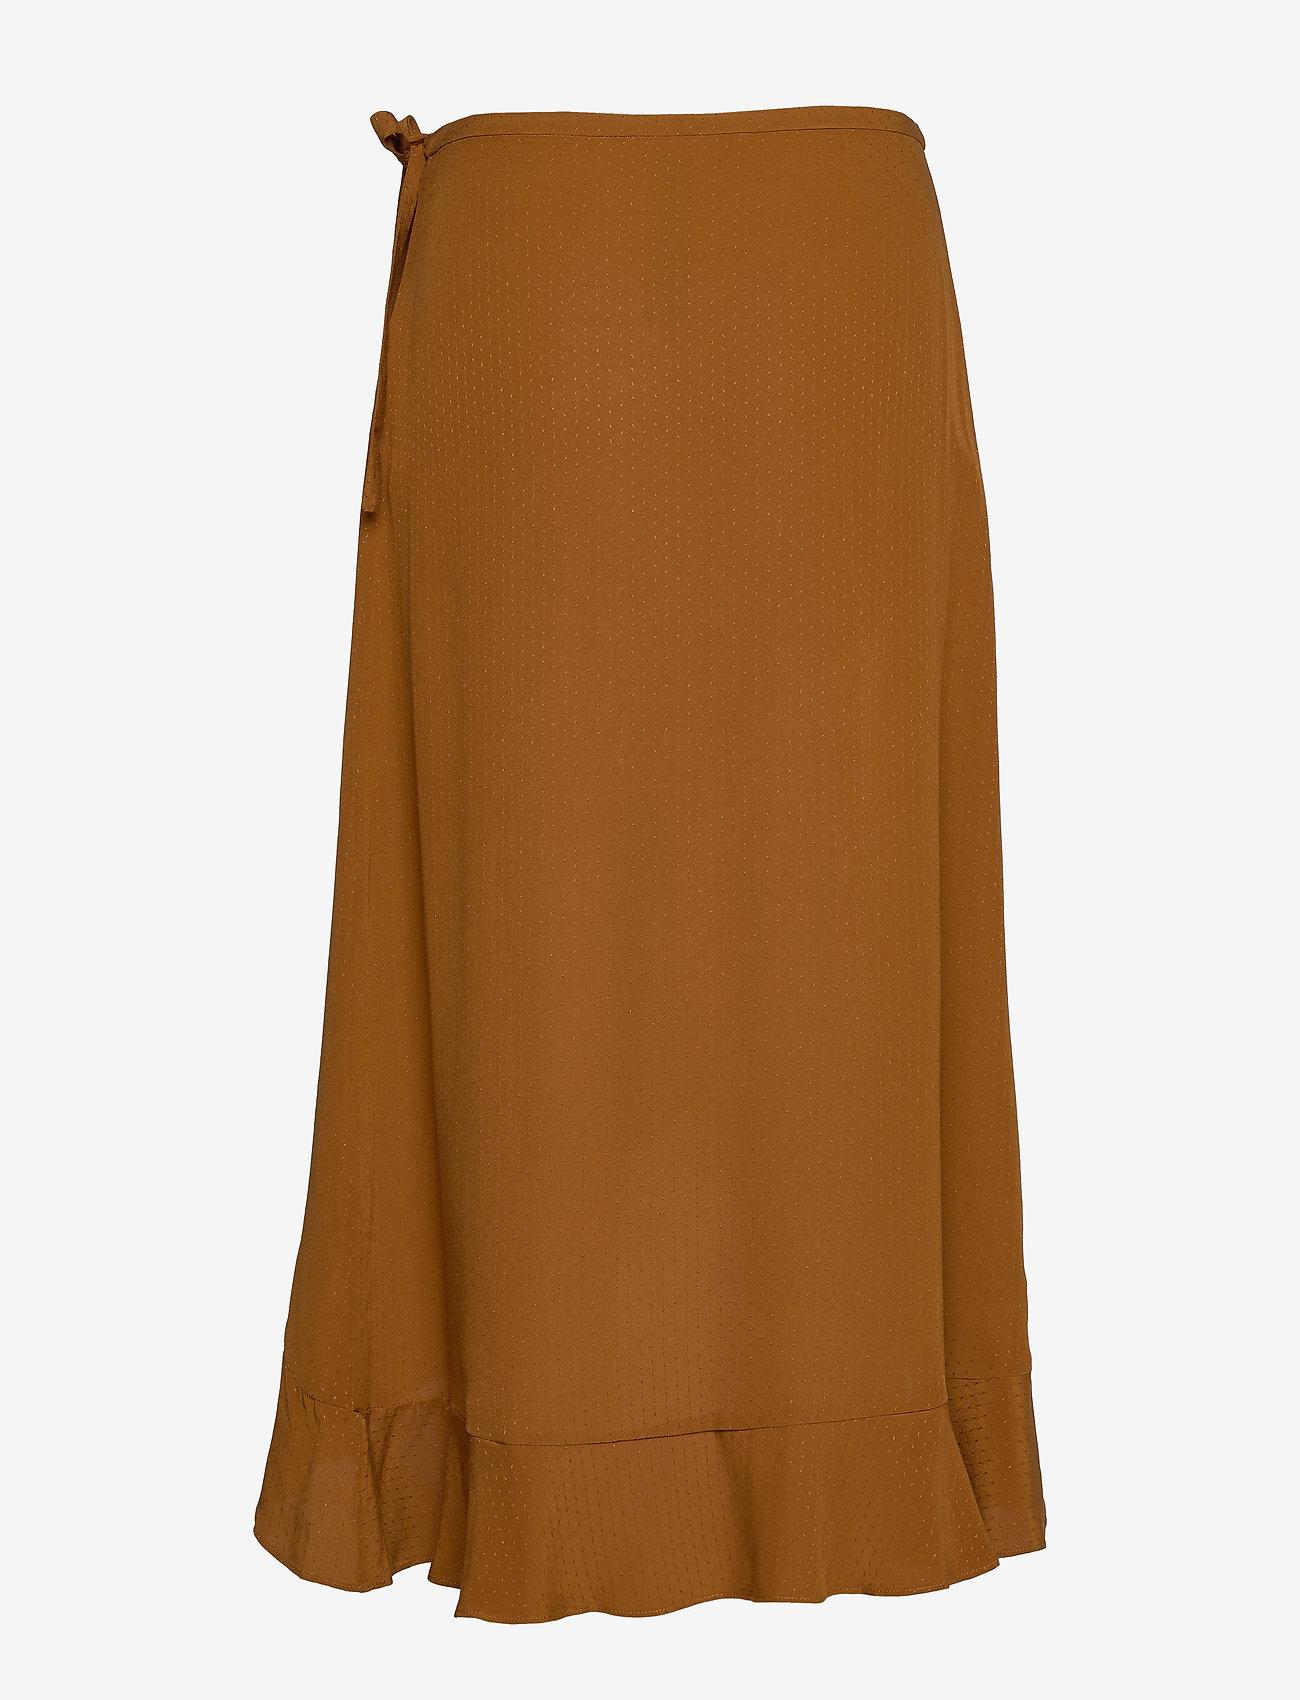 Limon L Wrap Skirt 10458 (Monks Robe) - Samsøe Samsøe IrZVUa